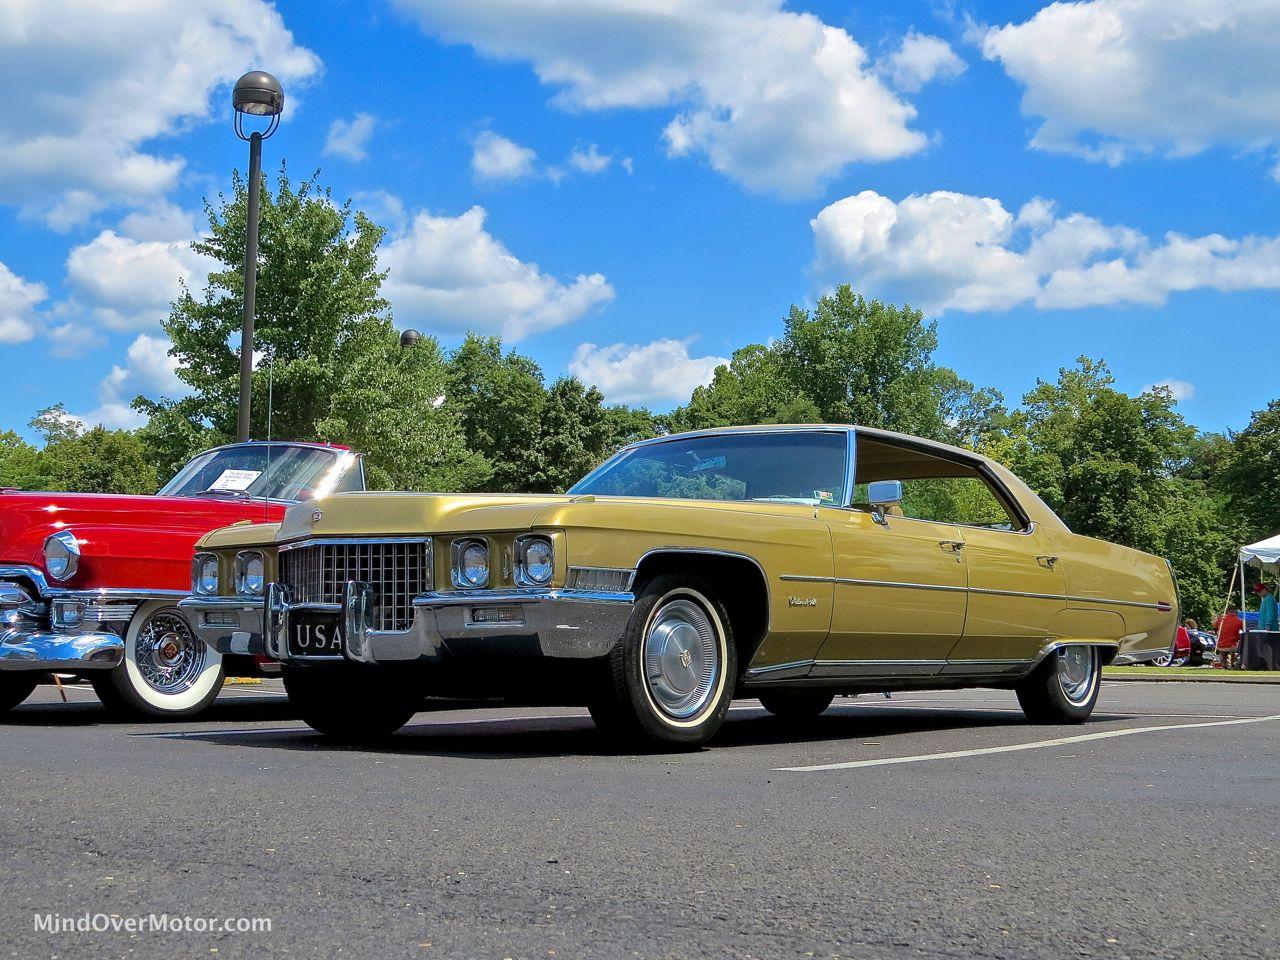 1971 Cadillac Sedan DeVille Front Left